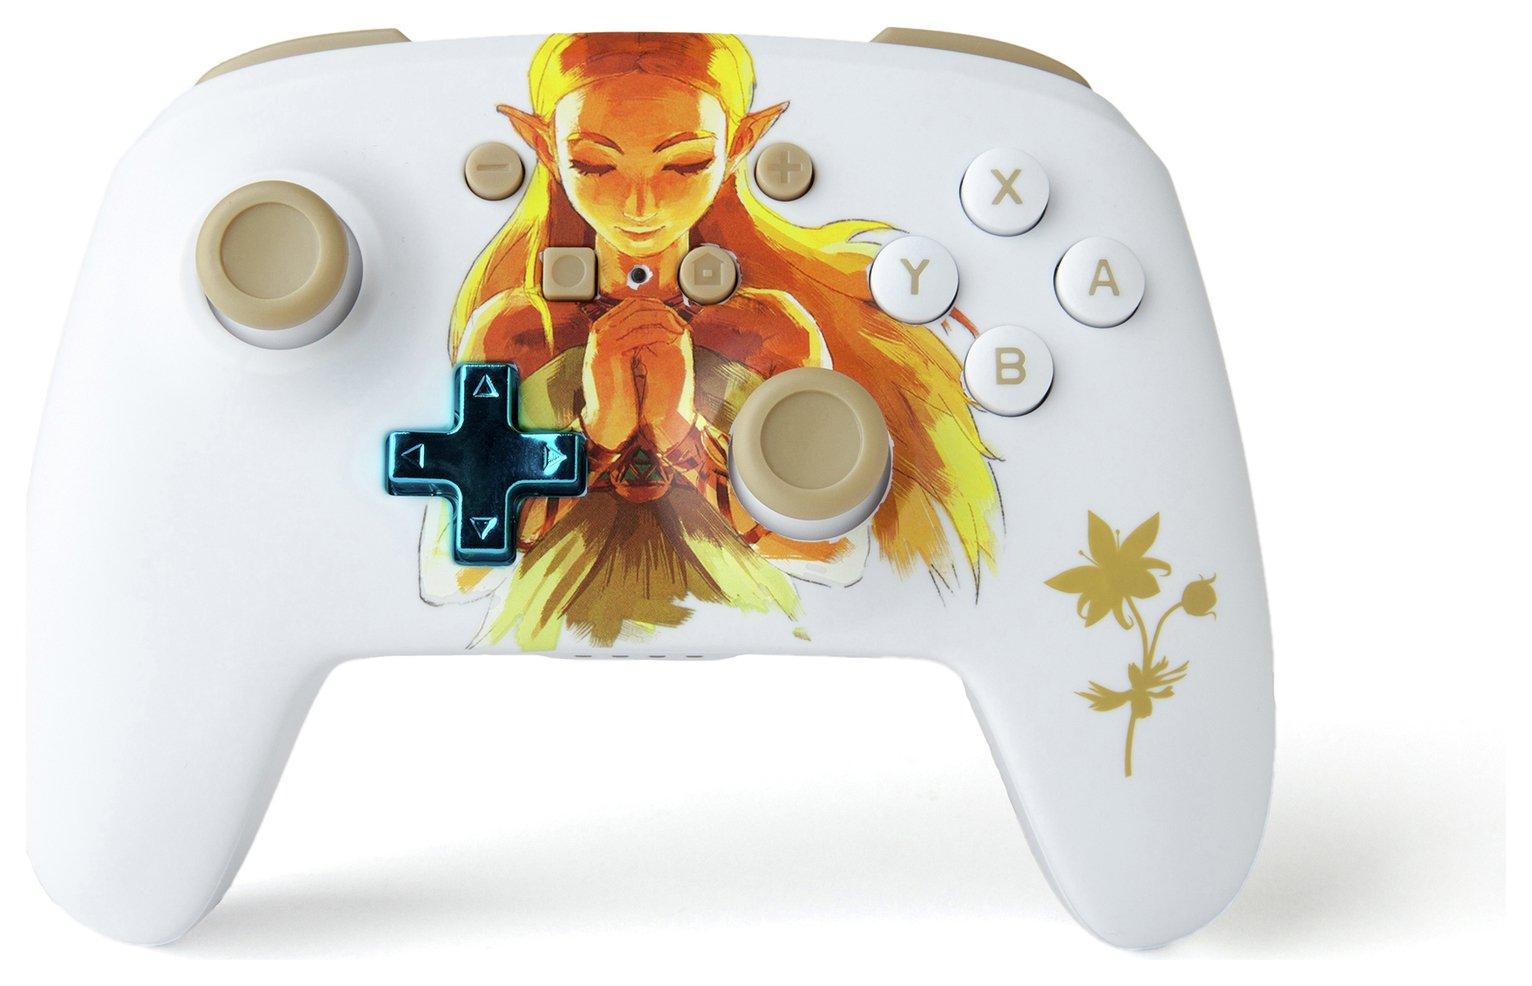 Nintendo Switch Wireless Controller - Princess Zelda - £29.99 + p&p £3.95 @ Argos